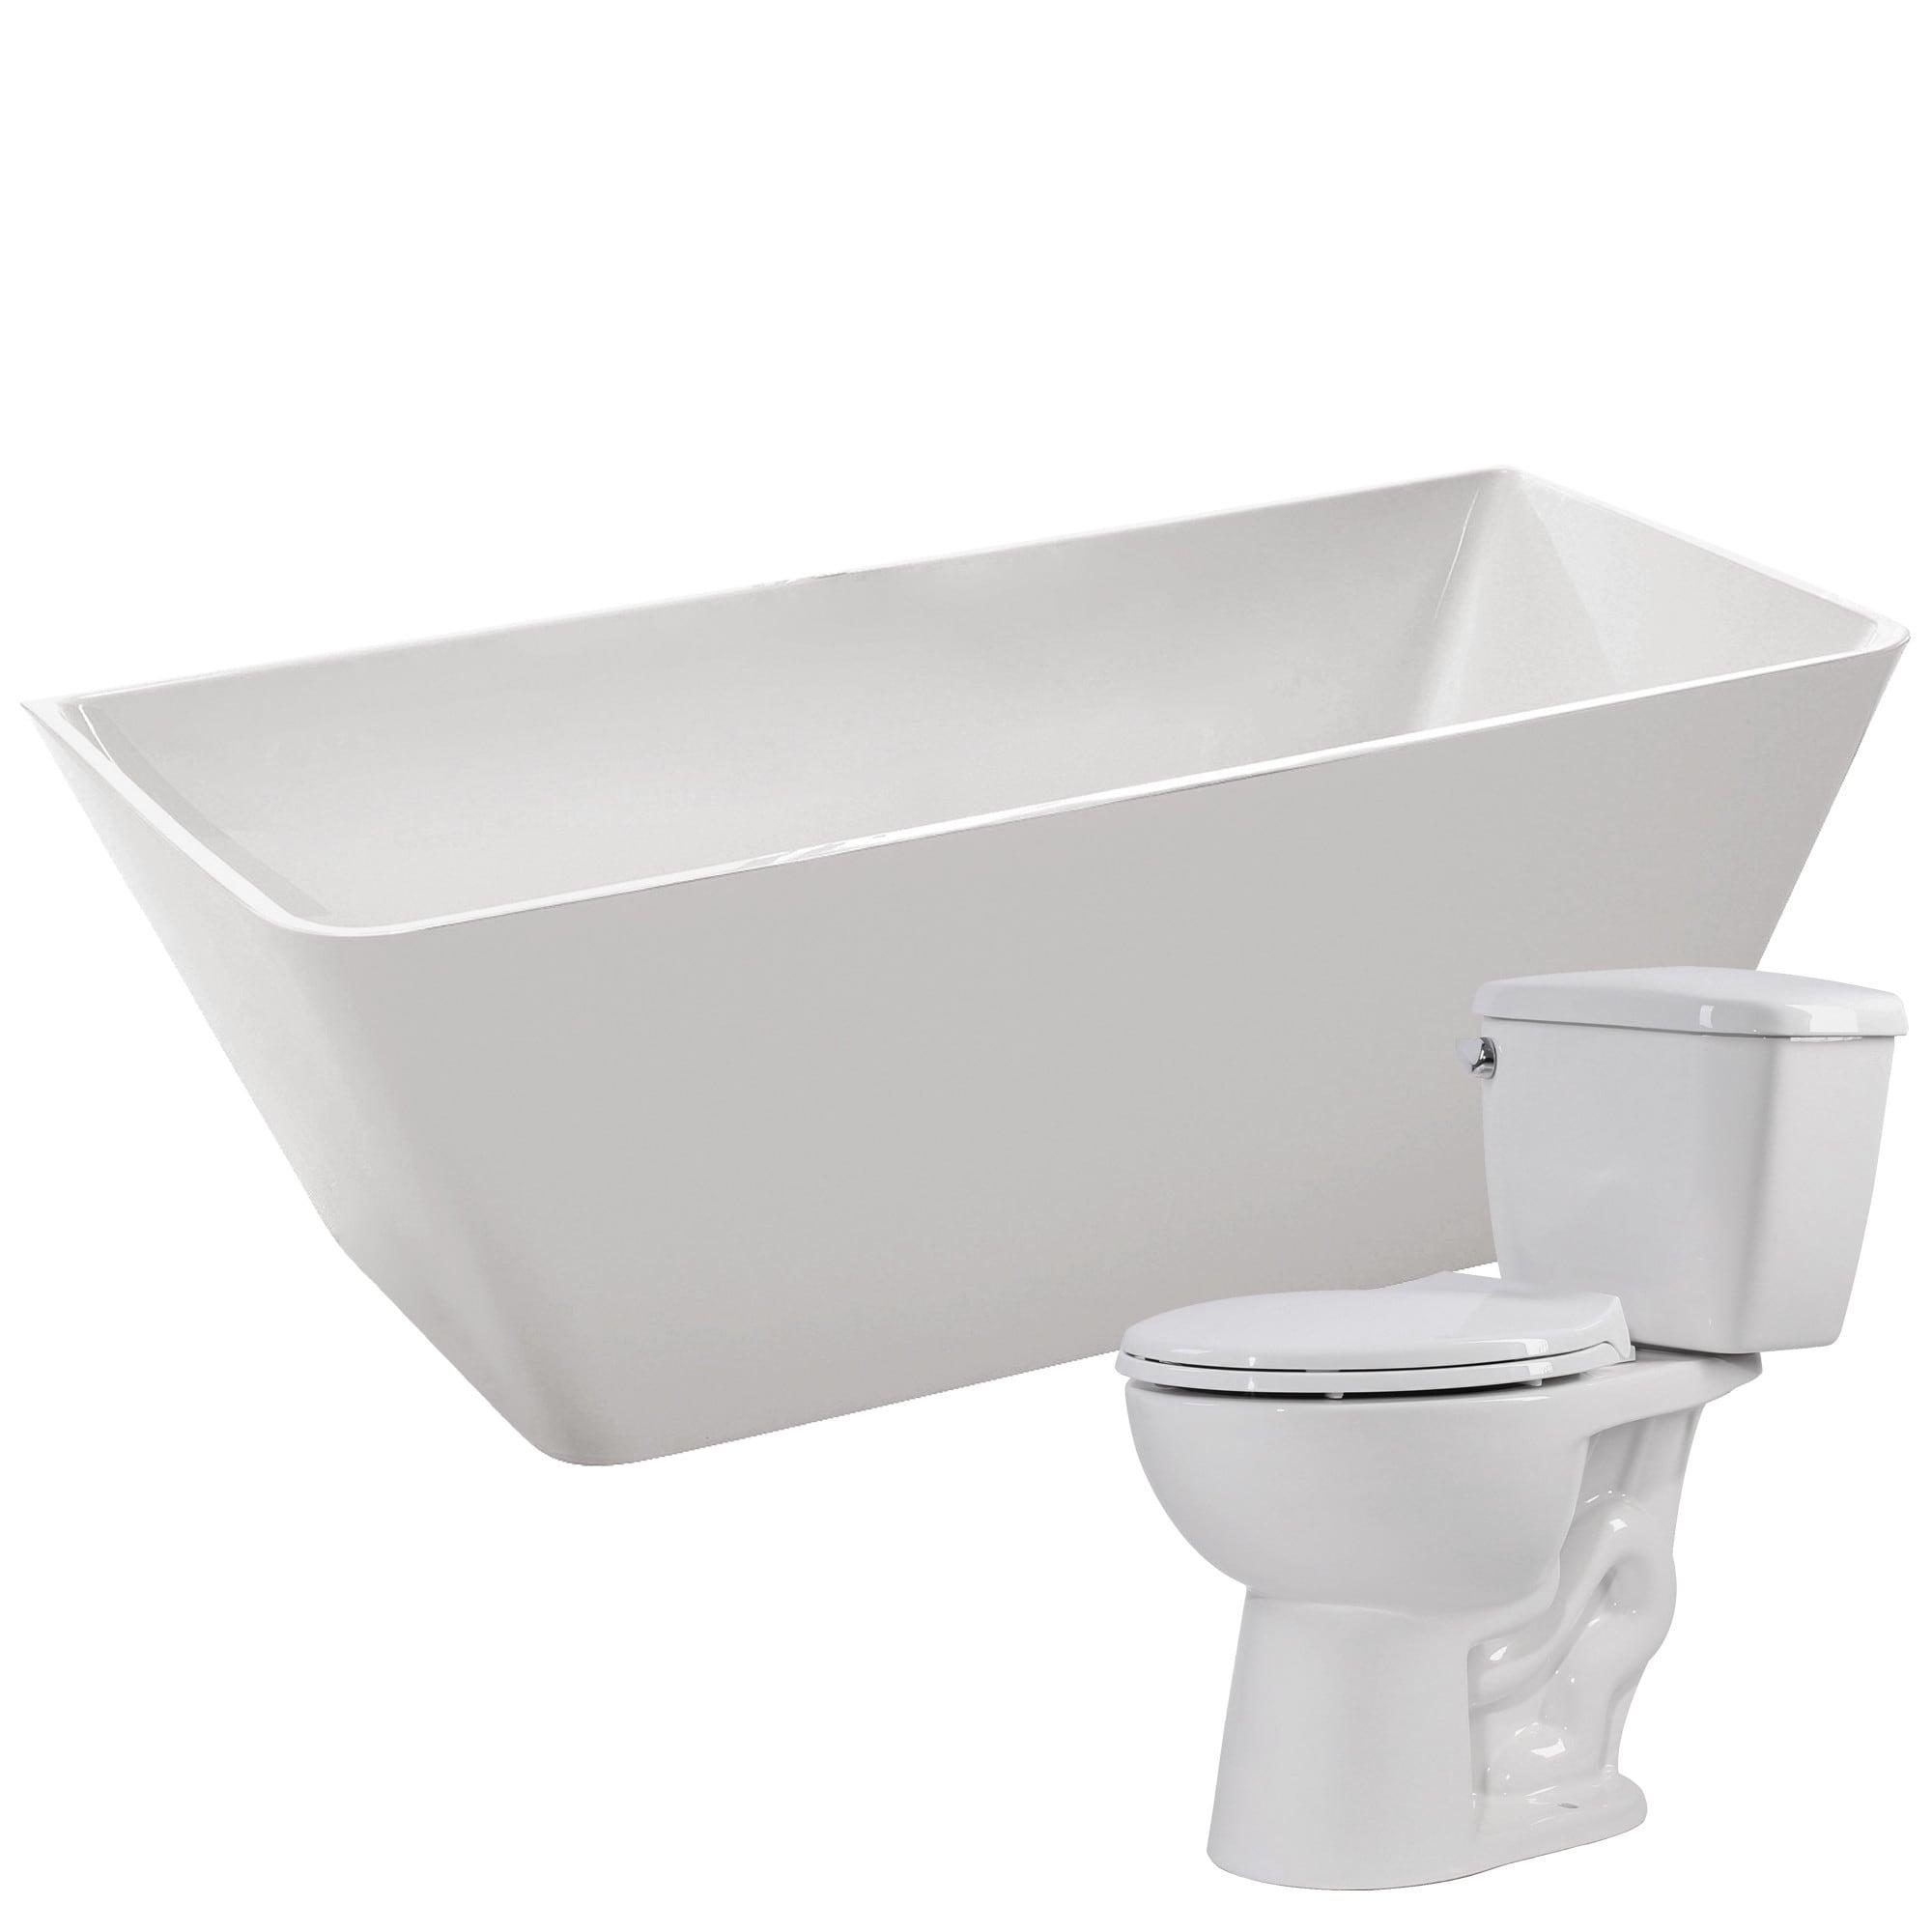 Shop Zenith 67 in. Acrylic Soaking Bathtub in White with Cavalier 2 ...